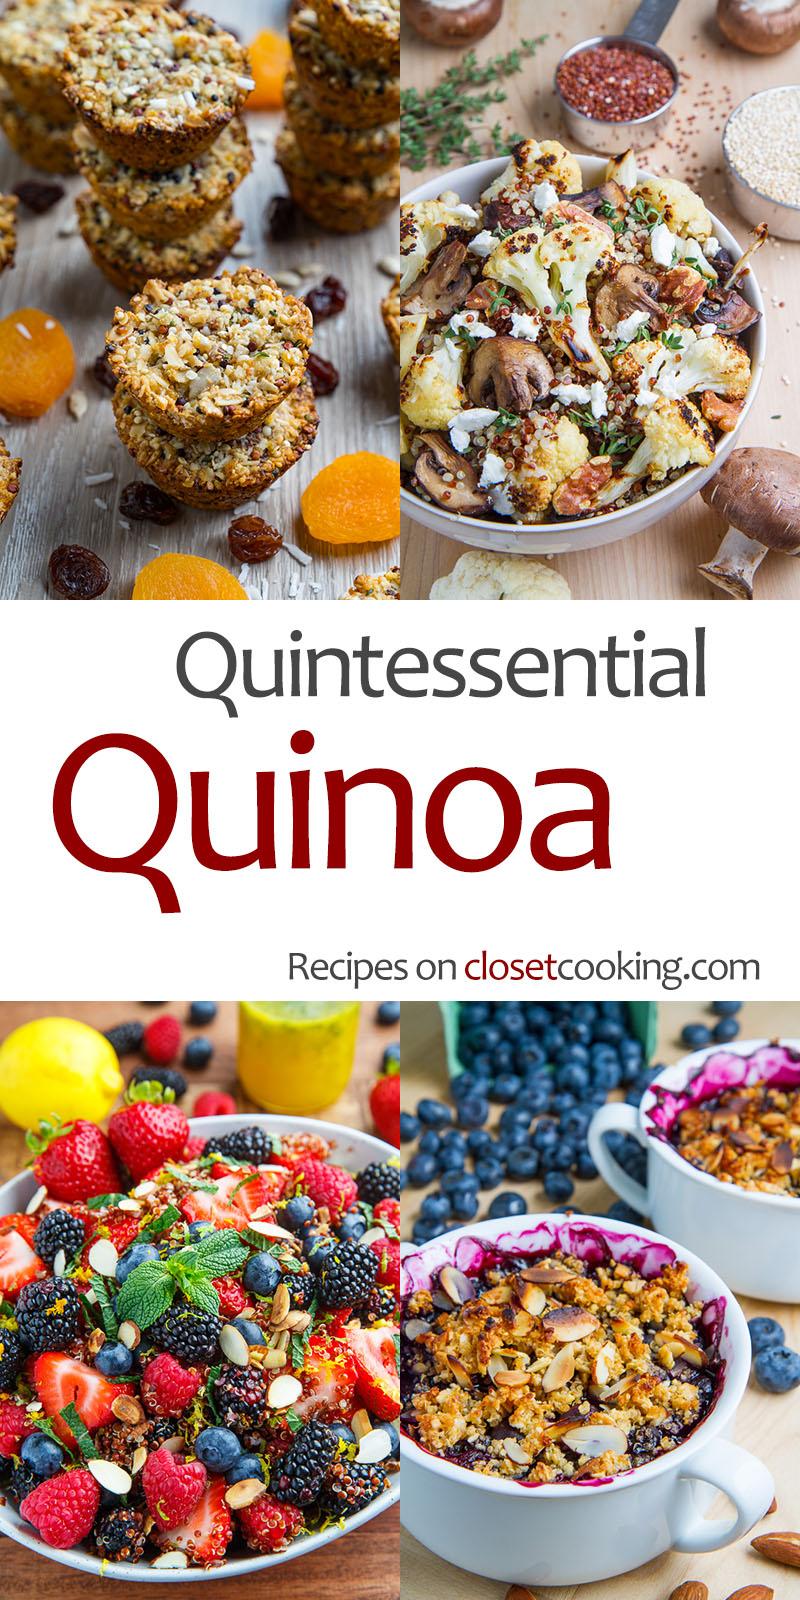 Quintessential Quinoa Recipes